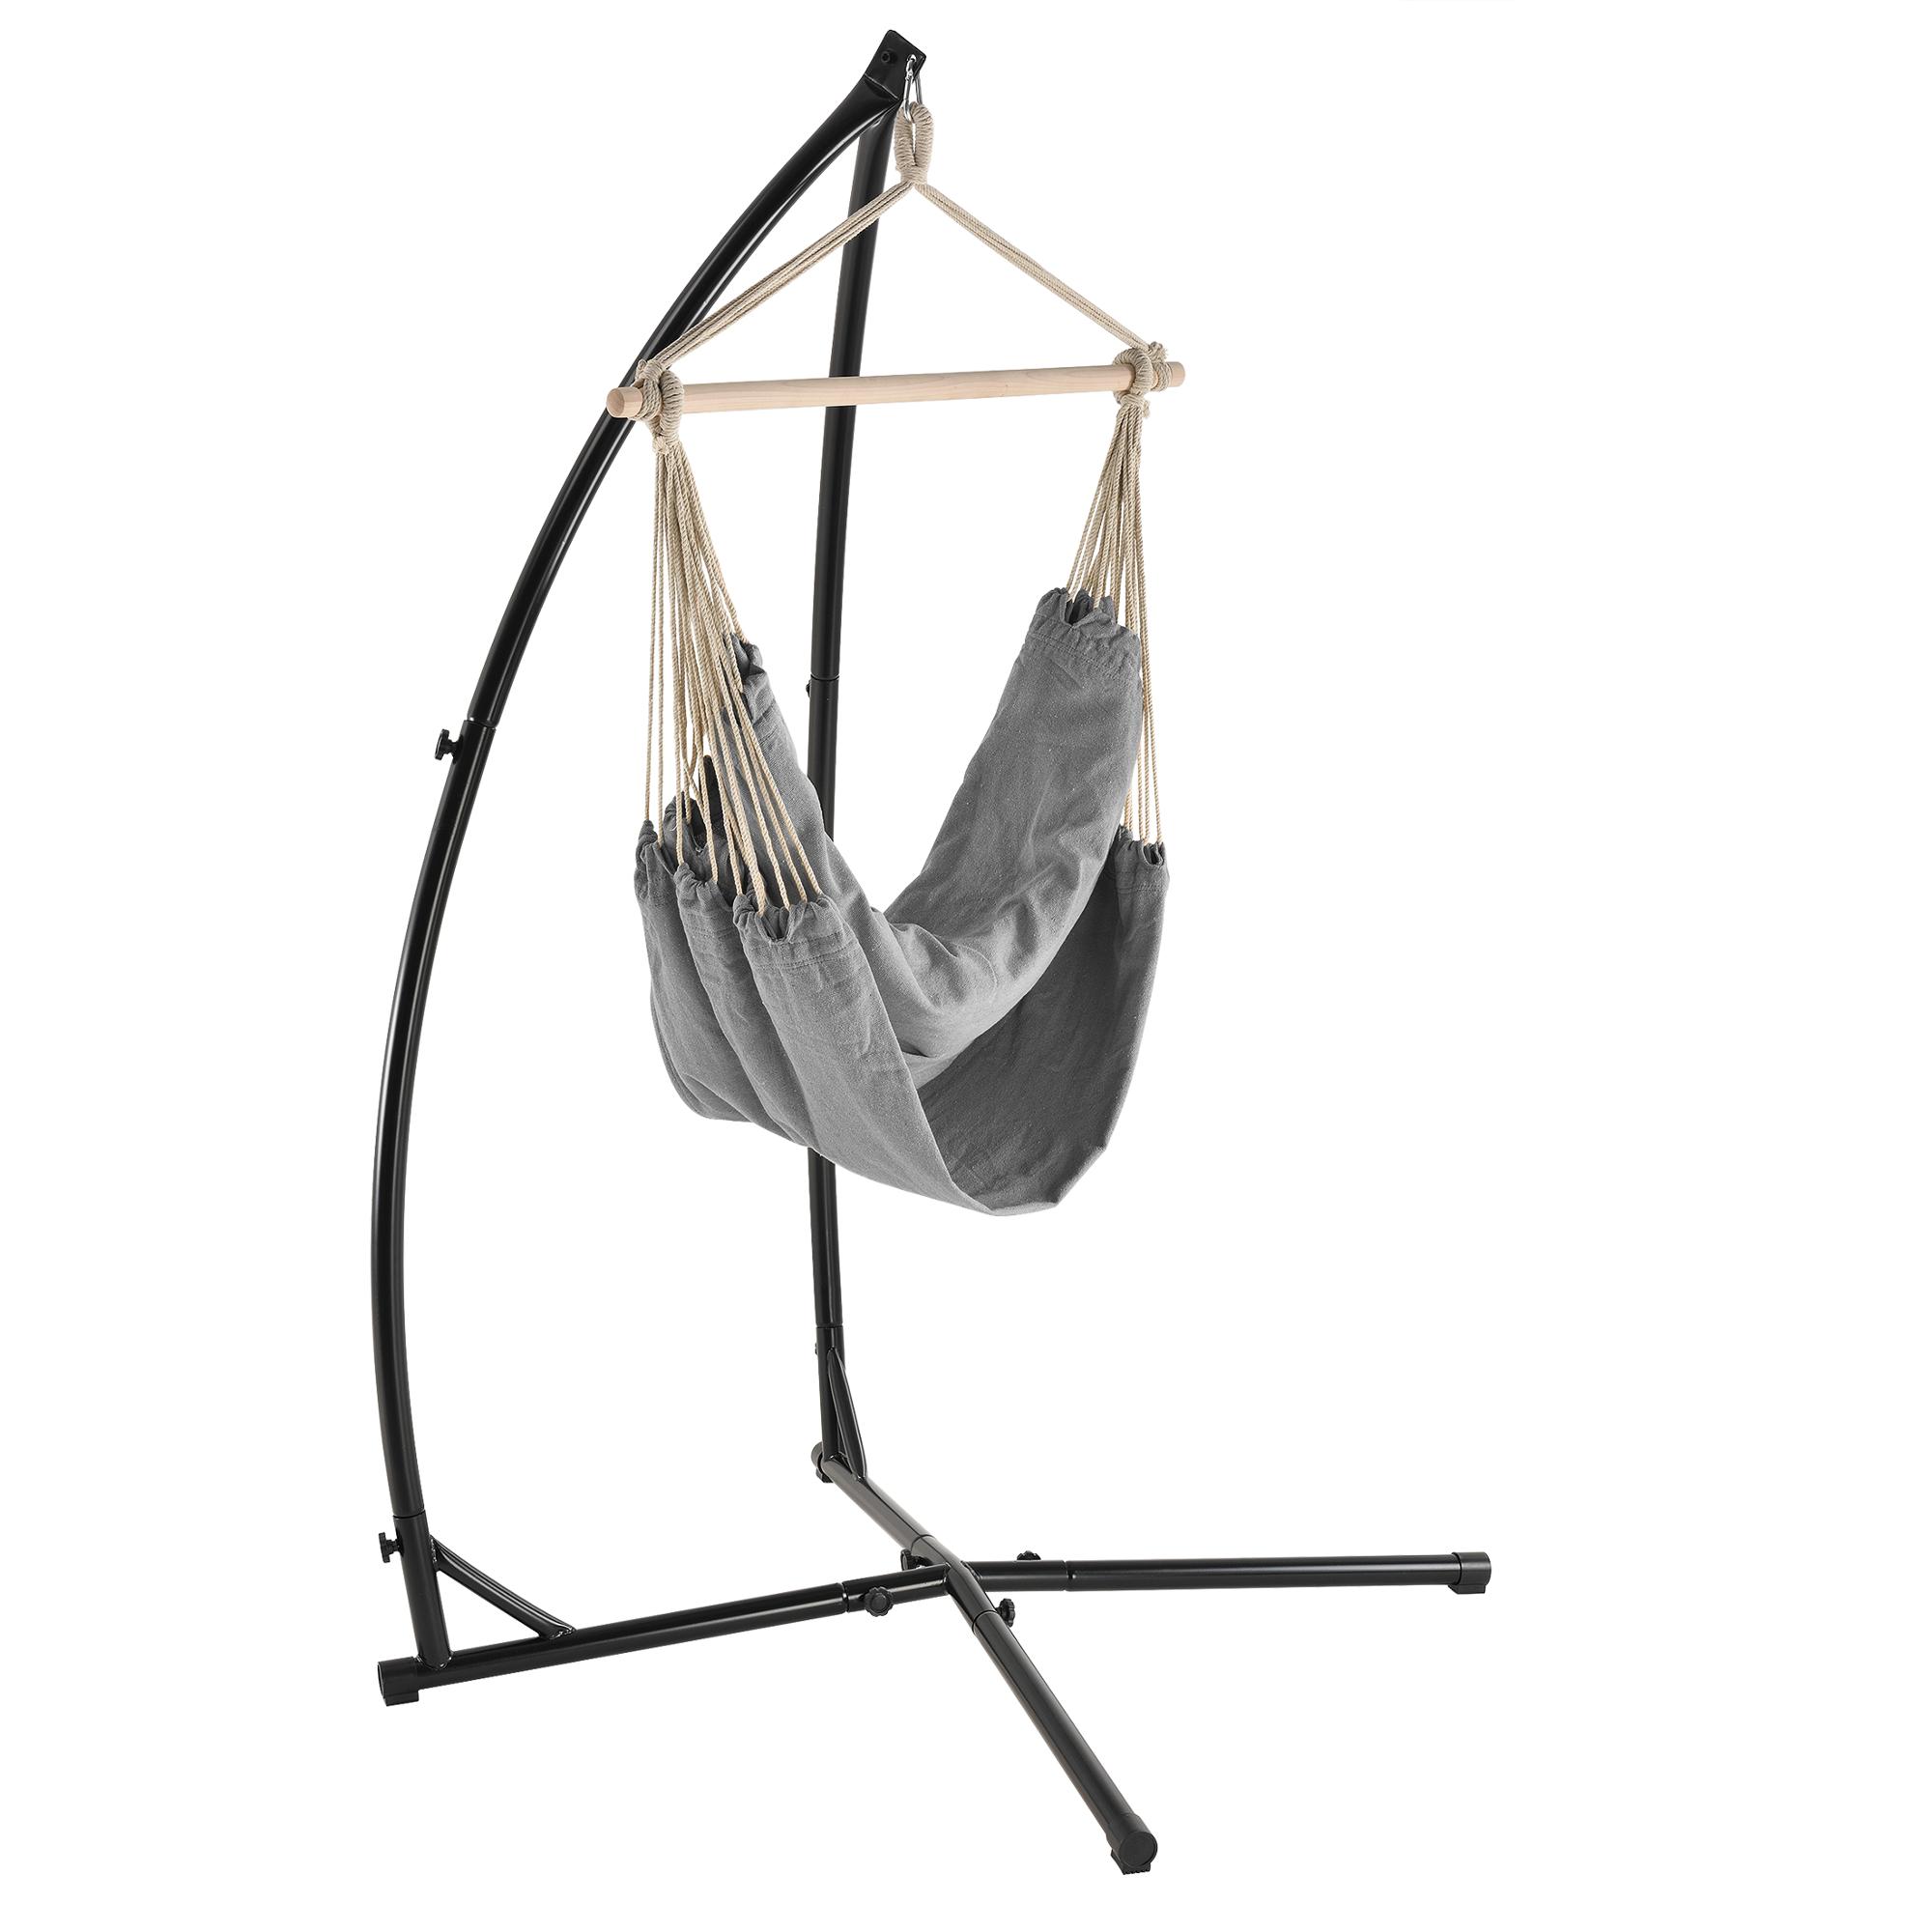 gestell fr hngesessel awesome kobolo hngestuhl hngekorb hngesessel belfi mit gestell. Black Bedroom Furniture Sets. Home Design Ideas